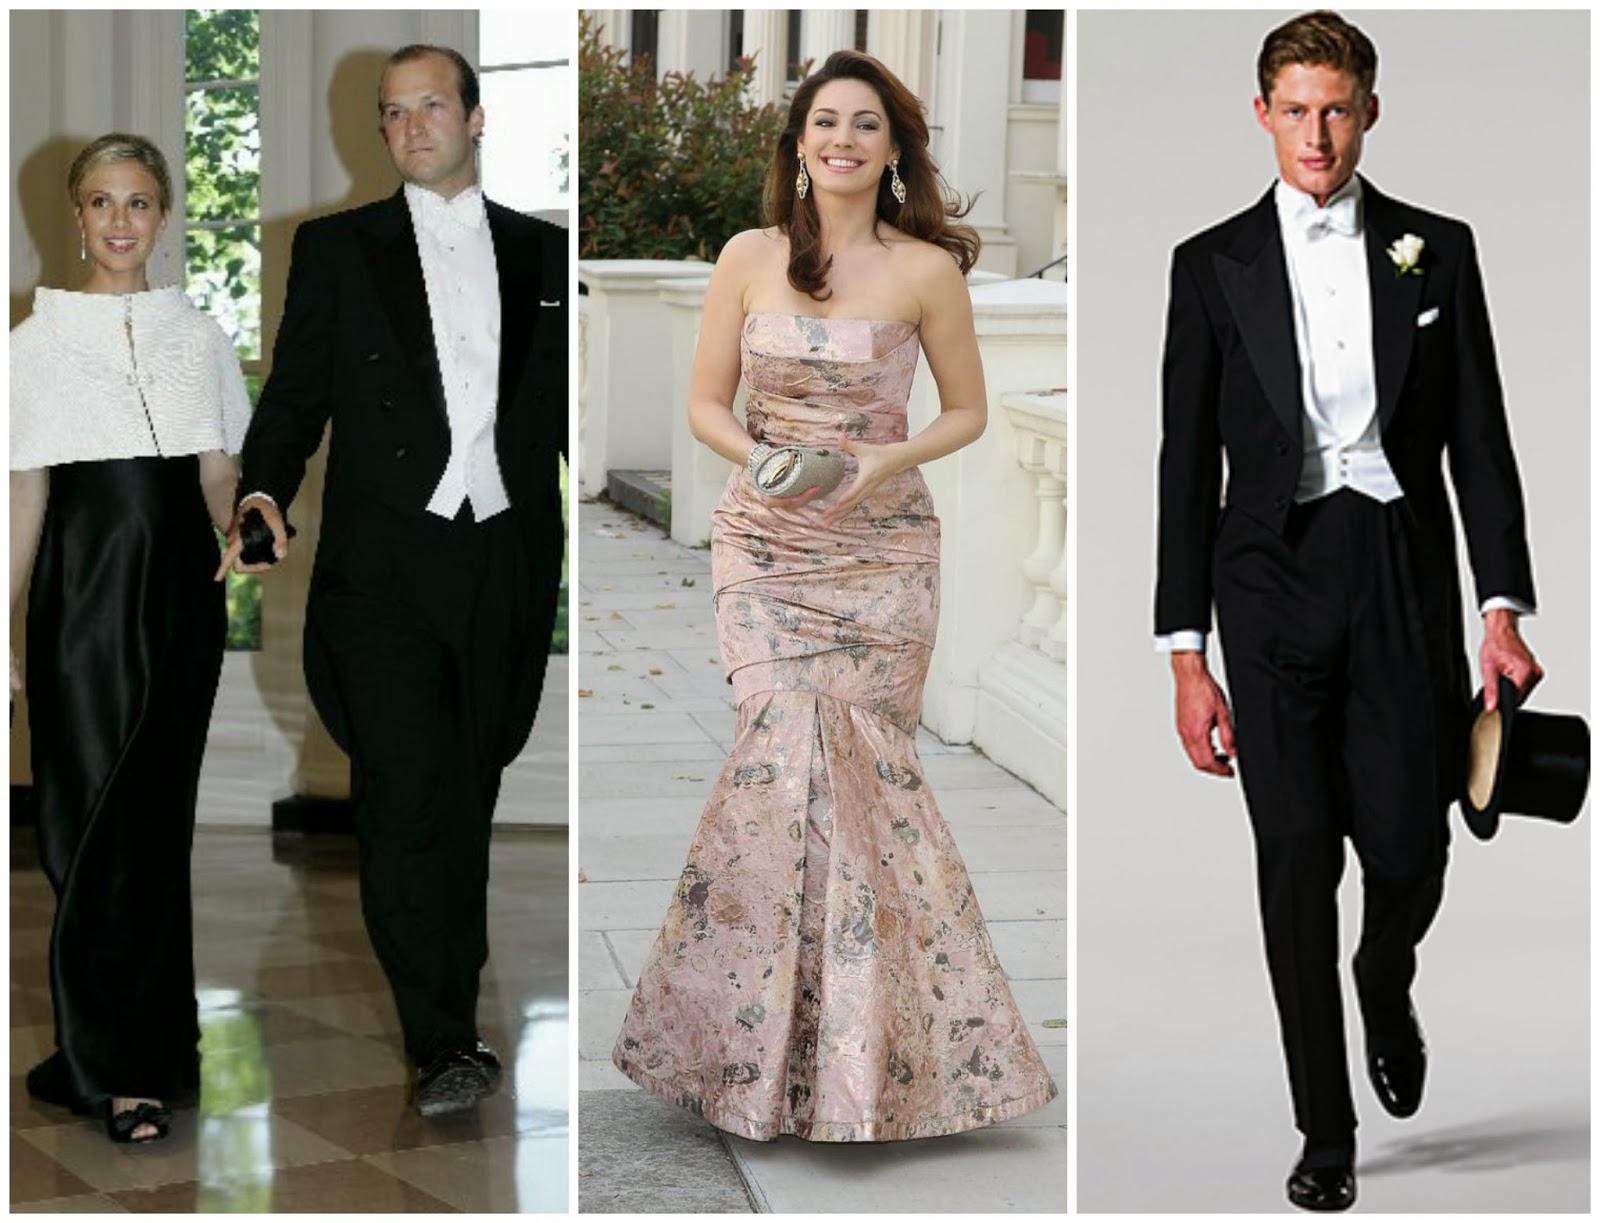 Black dress engagement photos - White Dress Code Parties Black Party Chic Dress Code